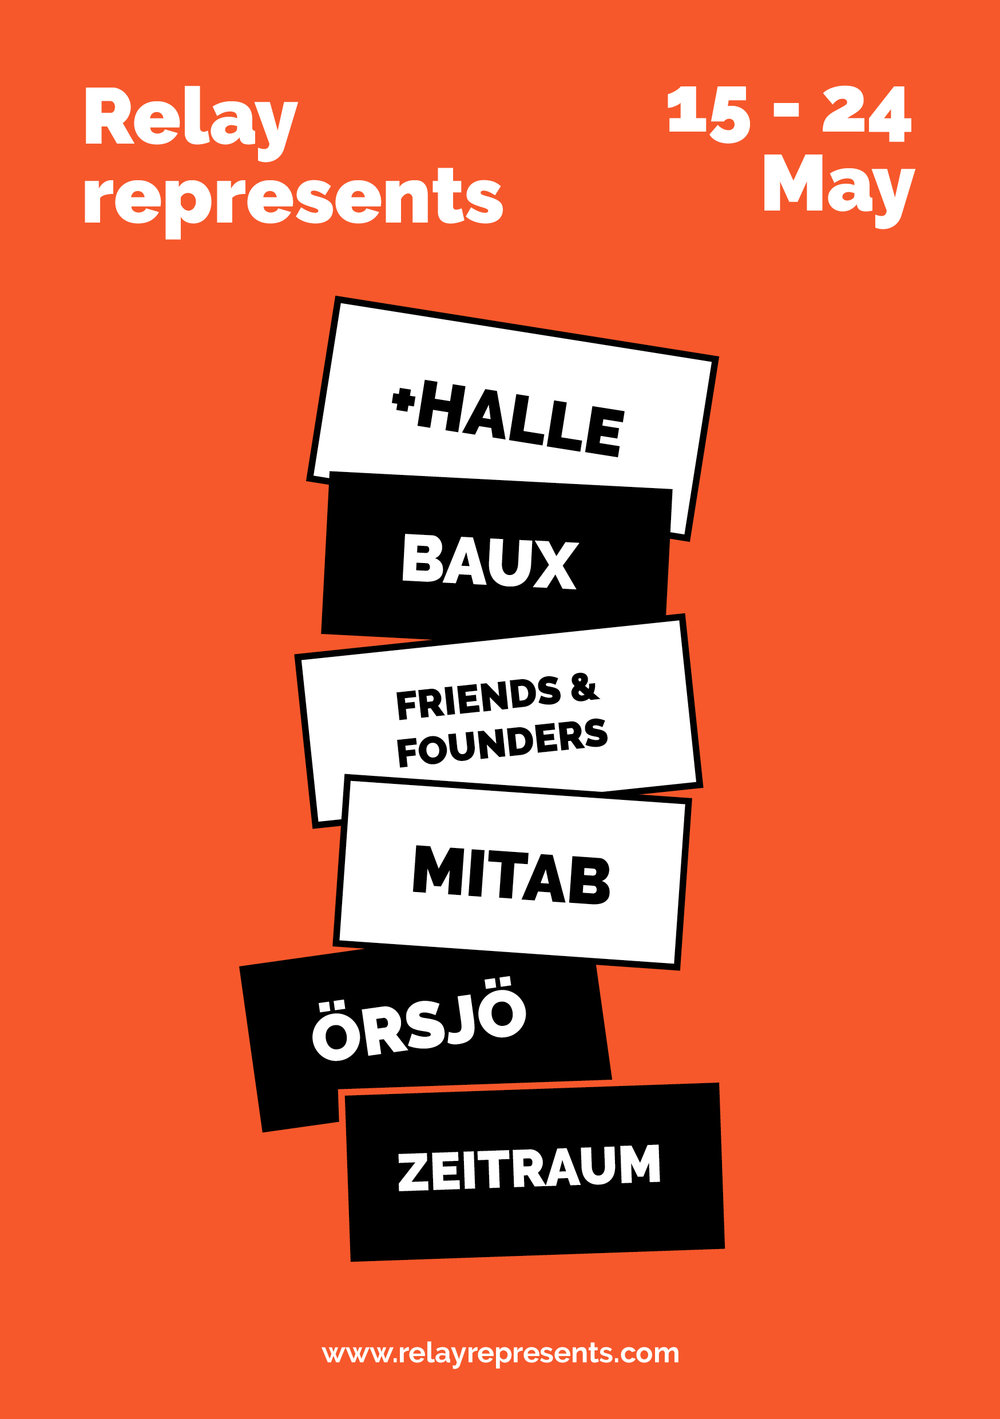 Relay Represents_Poster.jpg